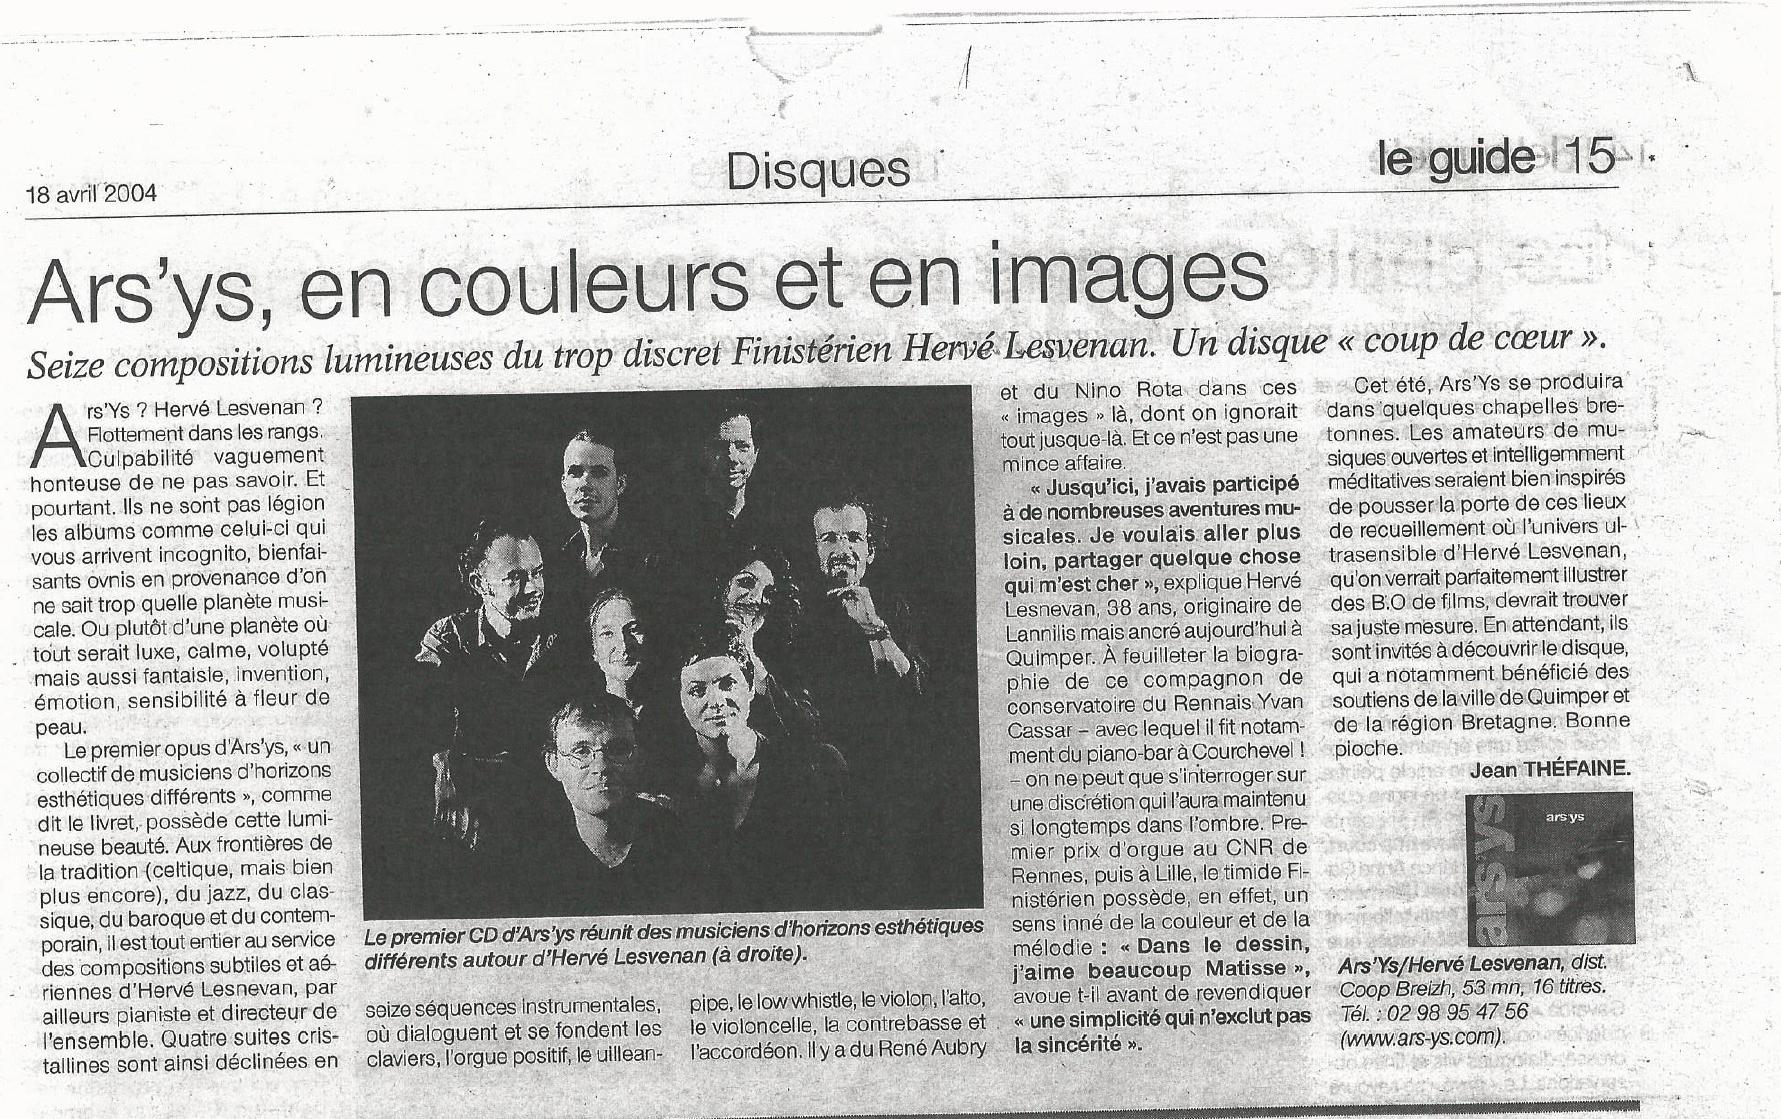 14_Hervé_Lesvenan_-_Ars'Ys_-_18_avril_2004